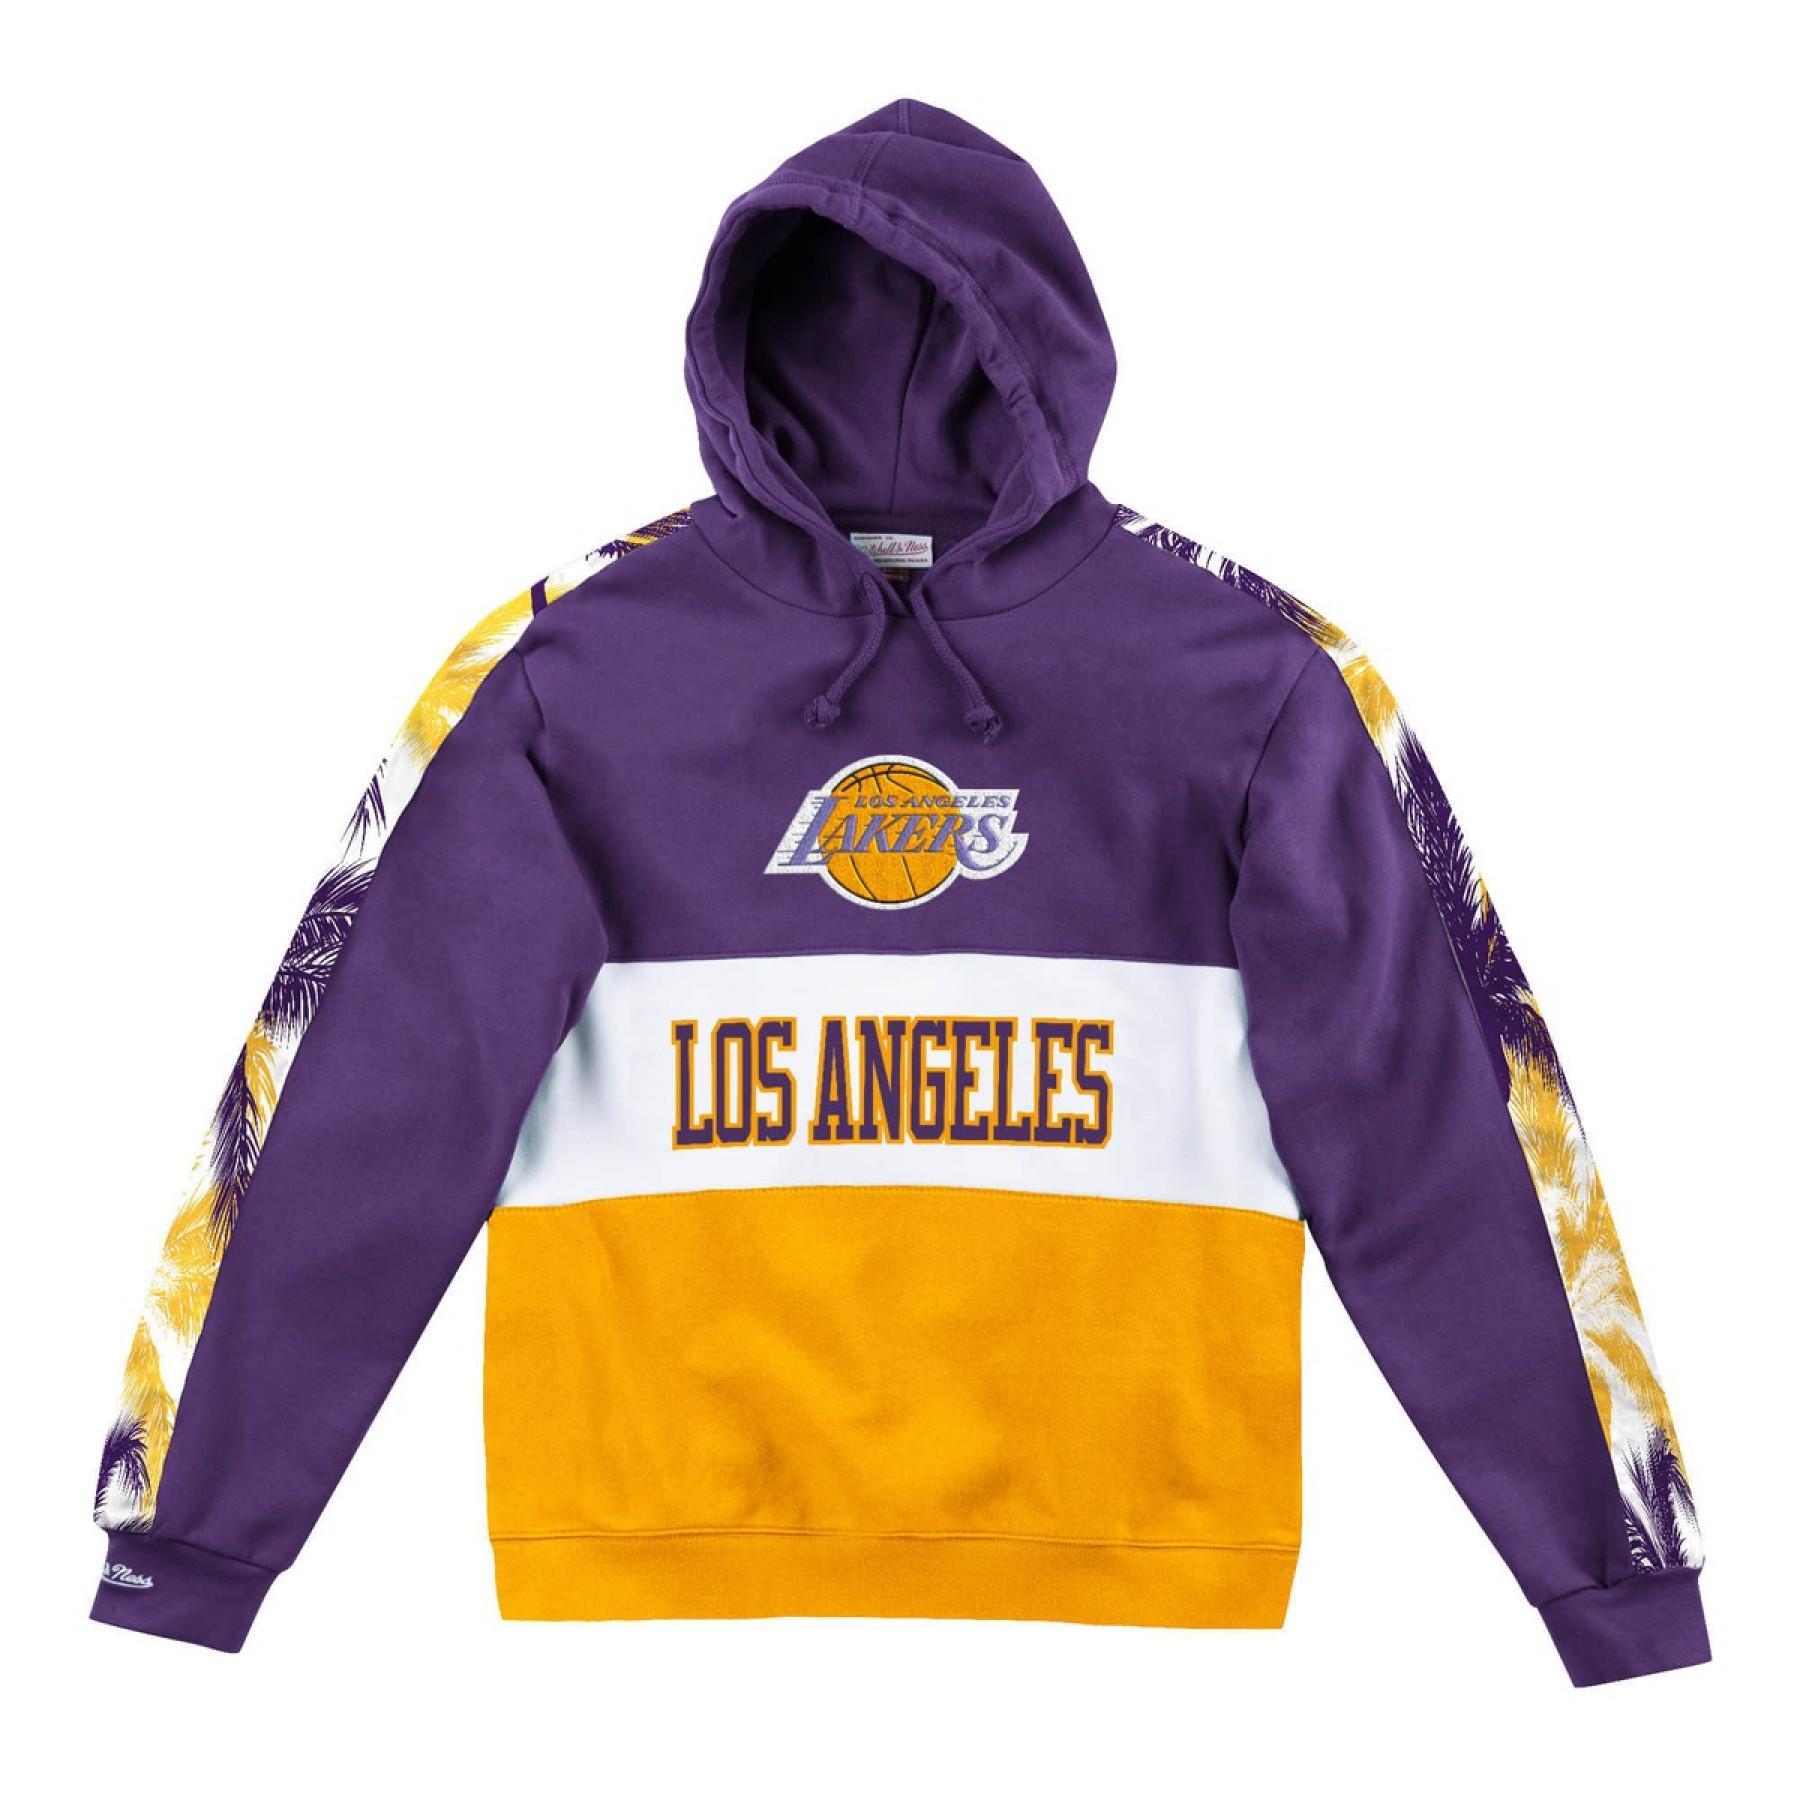 Felpa con cappuccio Los Angeles Lakers leading scorer